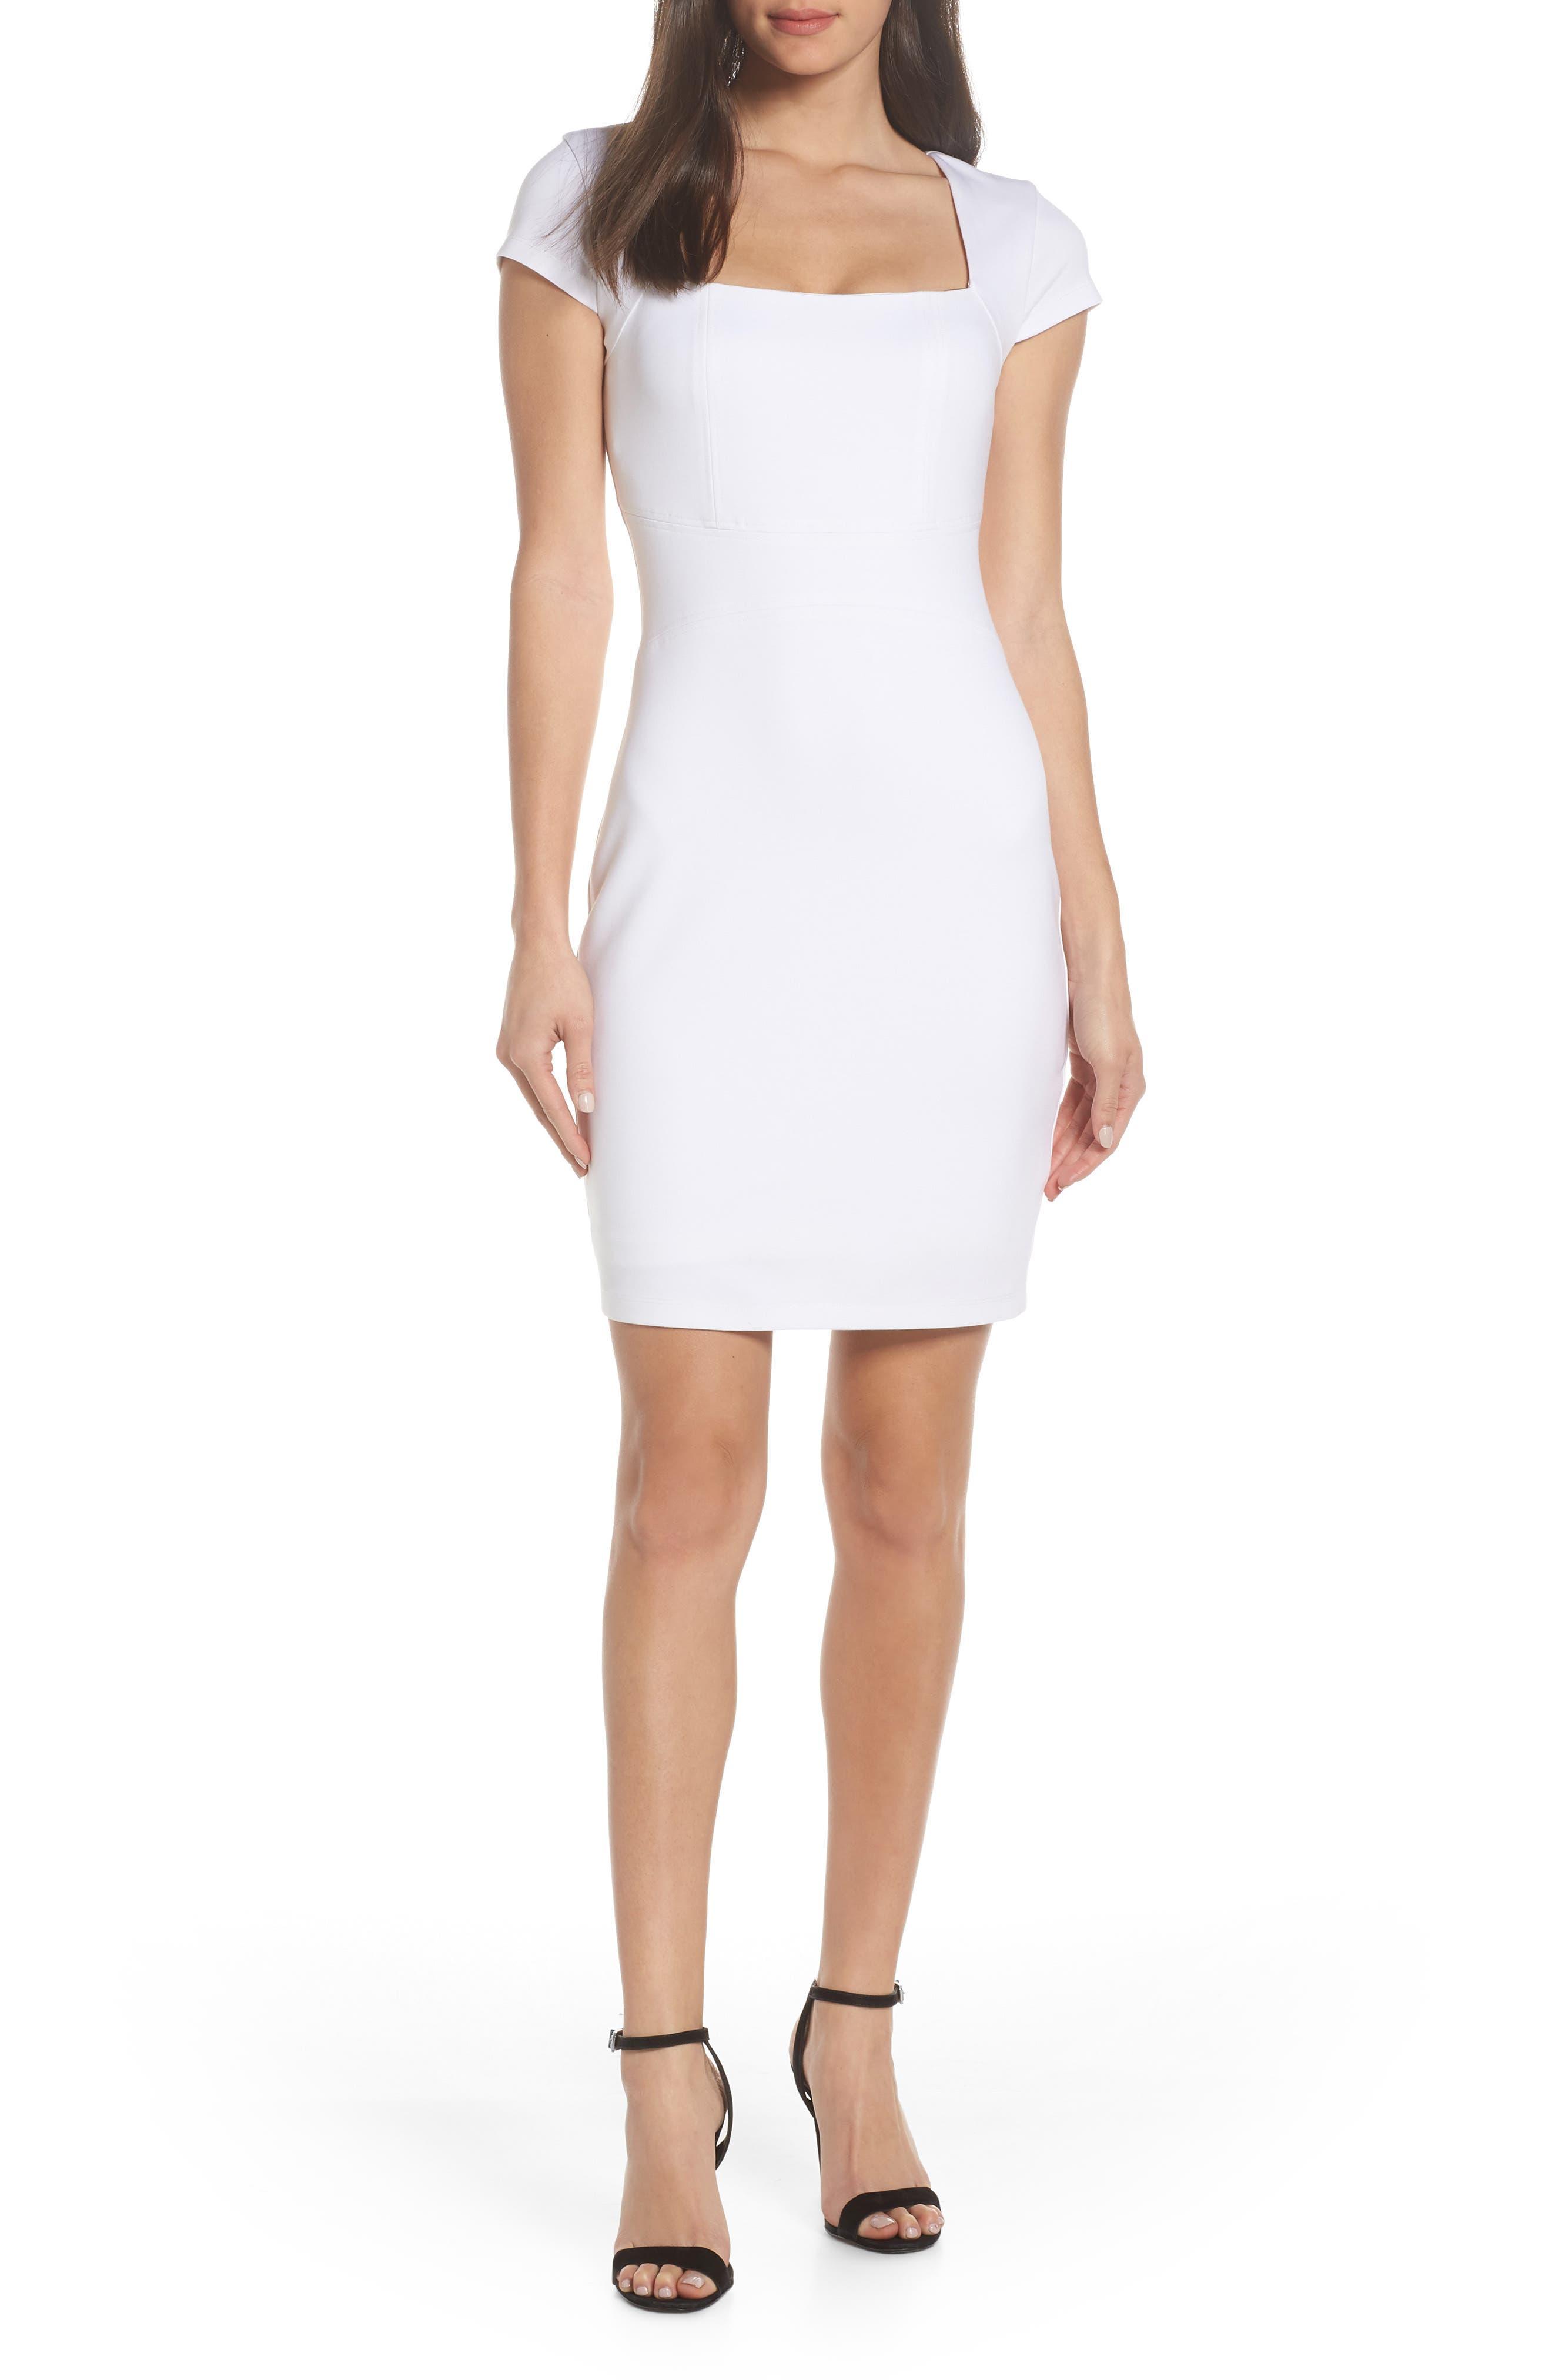 Ali & Jay Olive Street Body-Con Dress, White